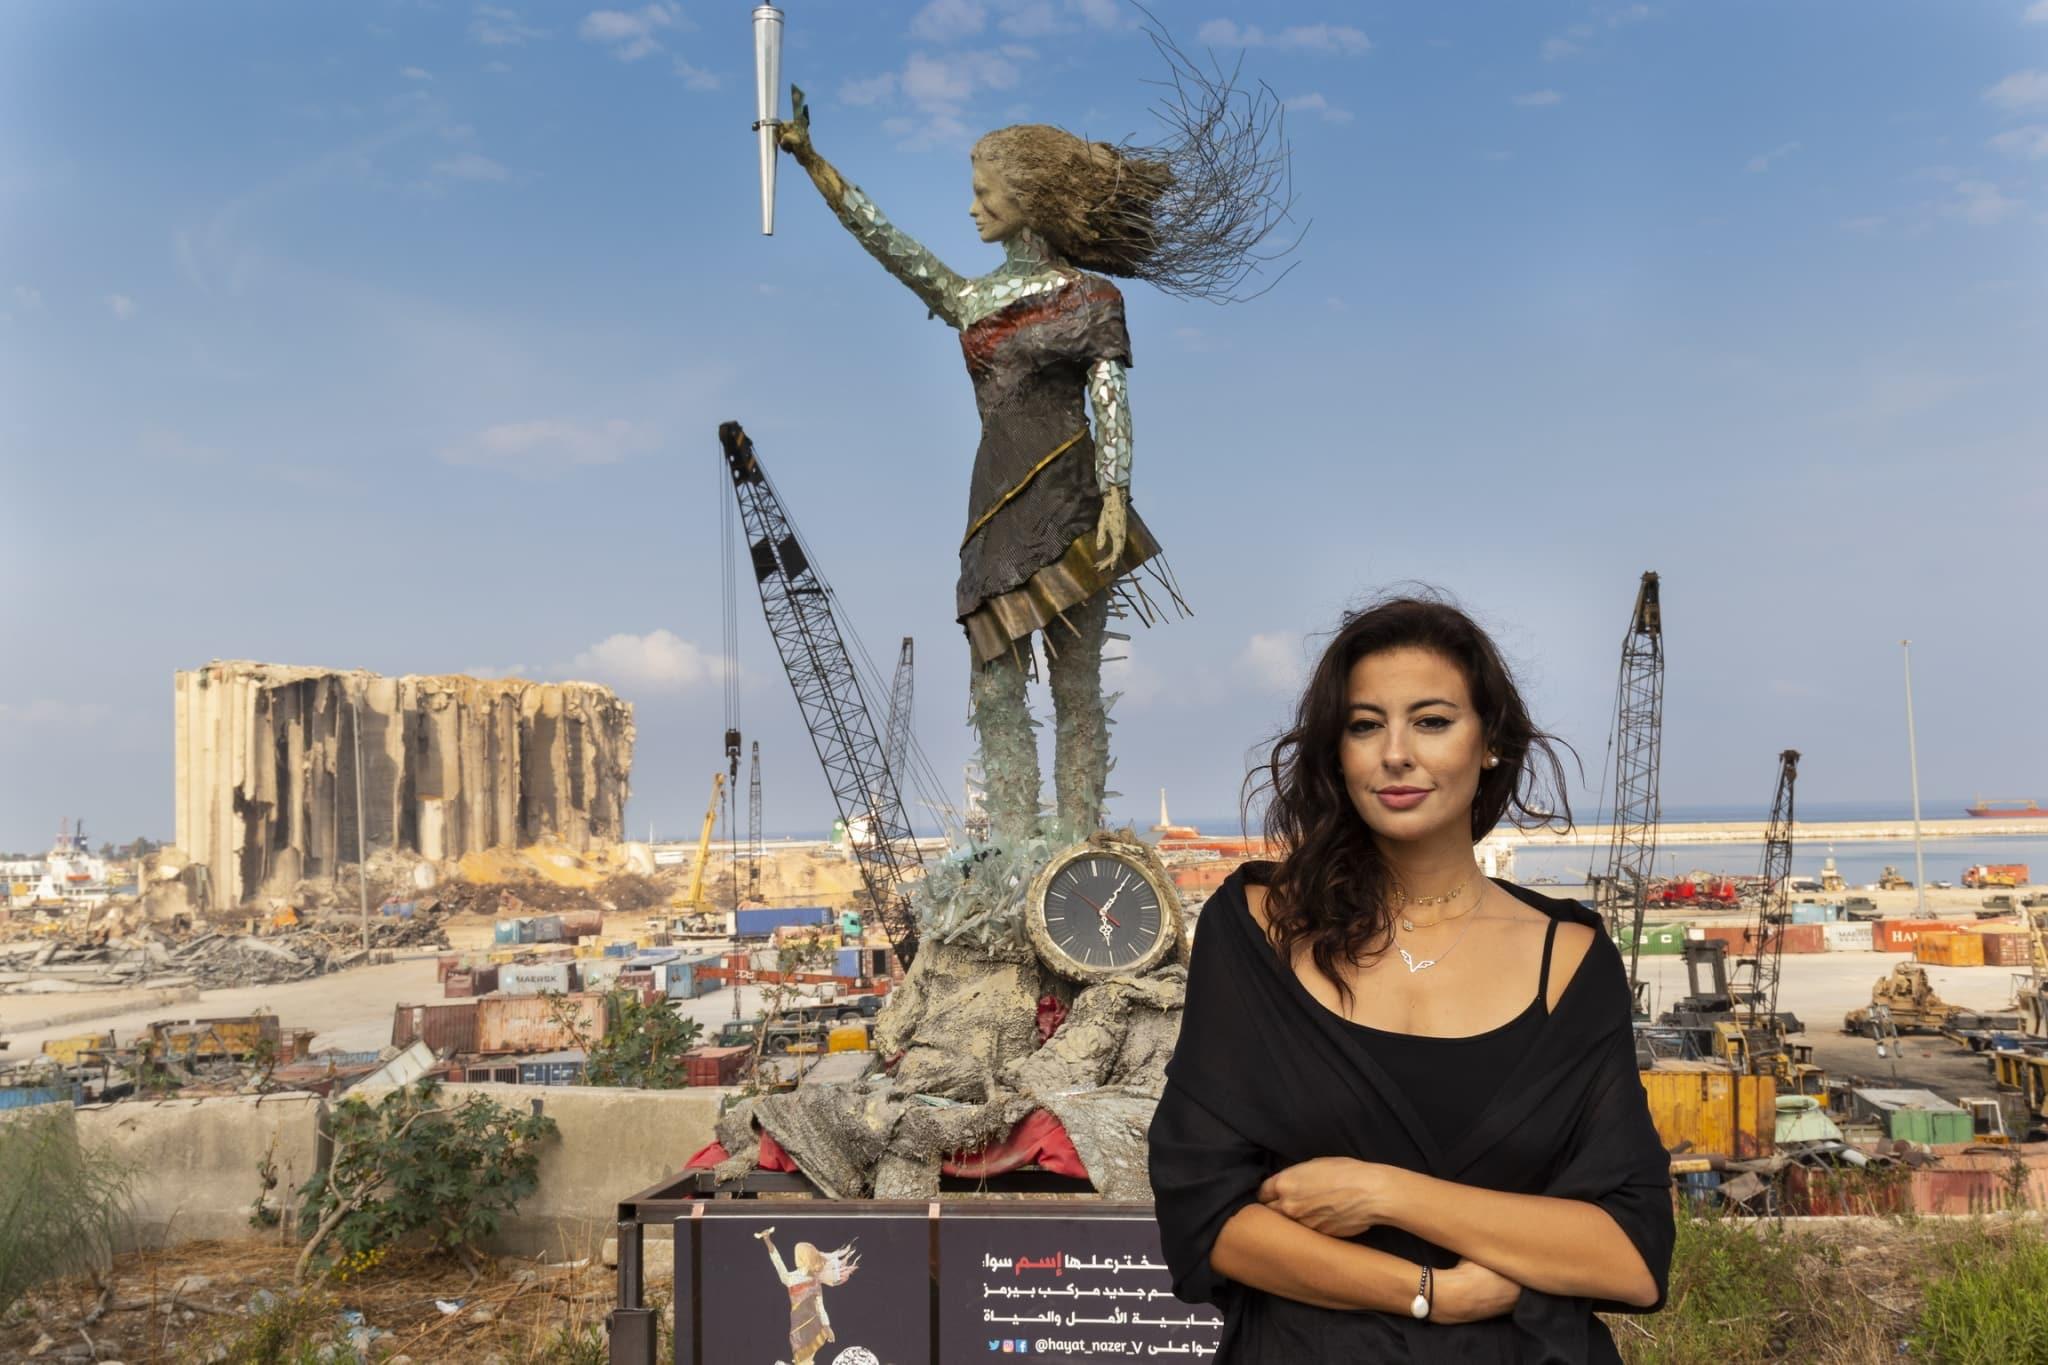 Une artiste libanaise